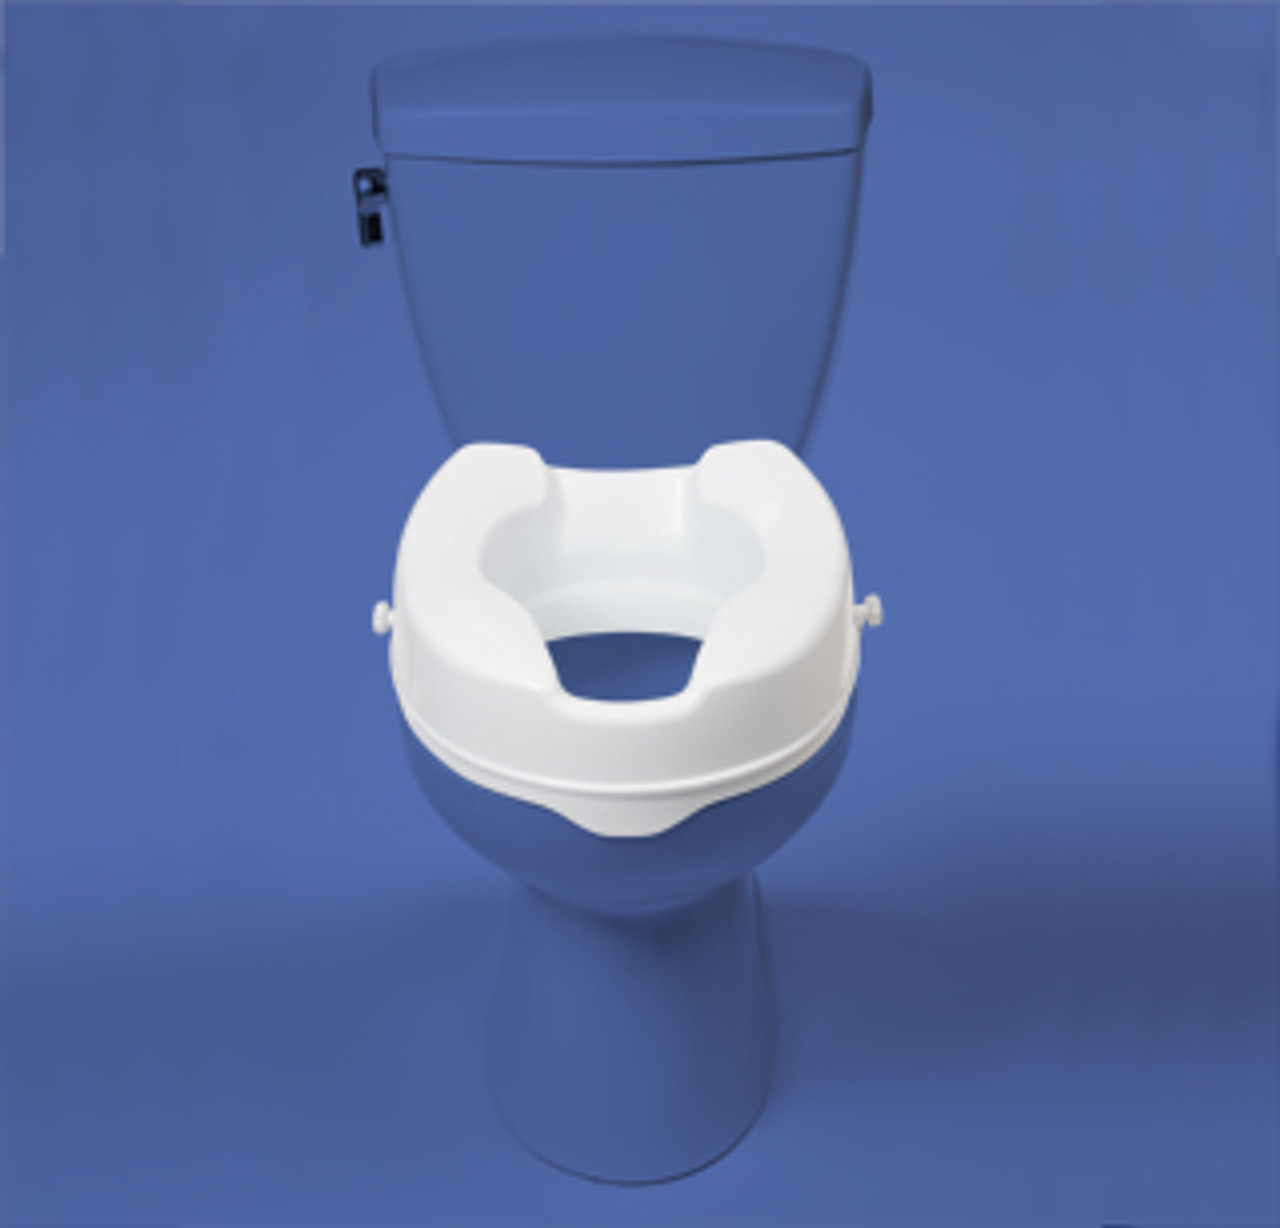 Remarkable 2 Raised Toilet Seat Frankydiablos Diy Chair Ideas Frankydiabloscom